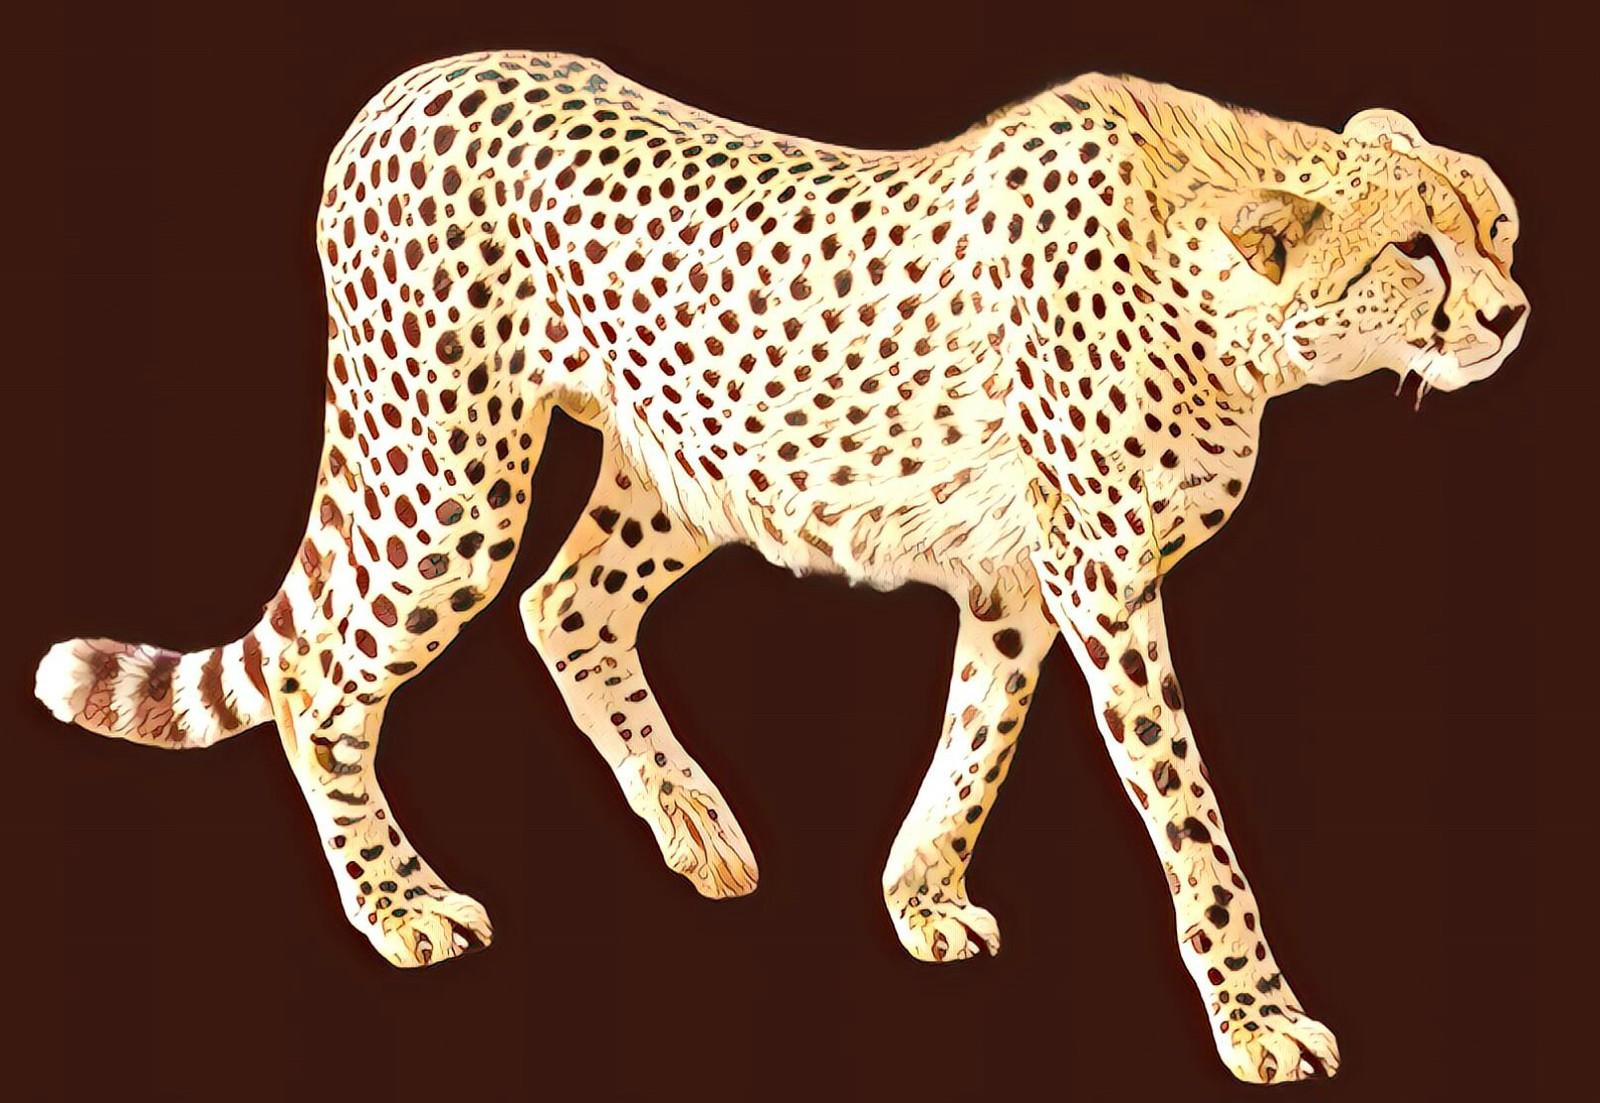 Leopard cat jaguar terrestrial. Cheetah clipart transparent background